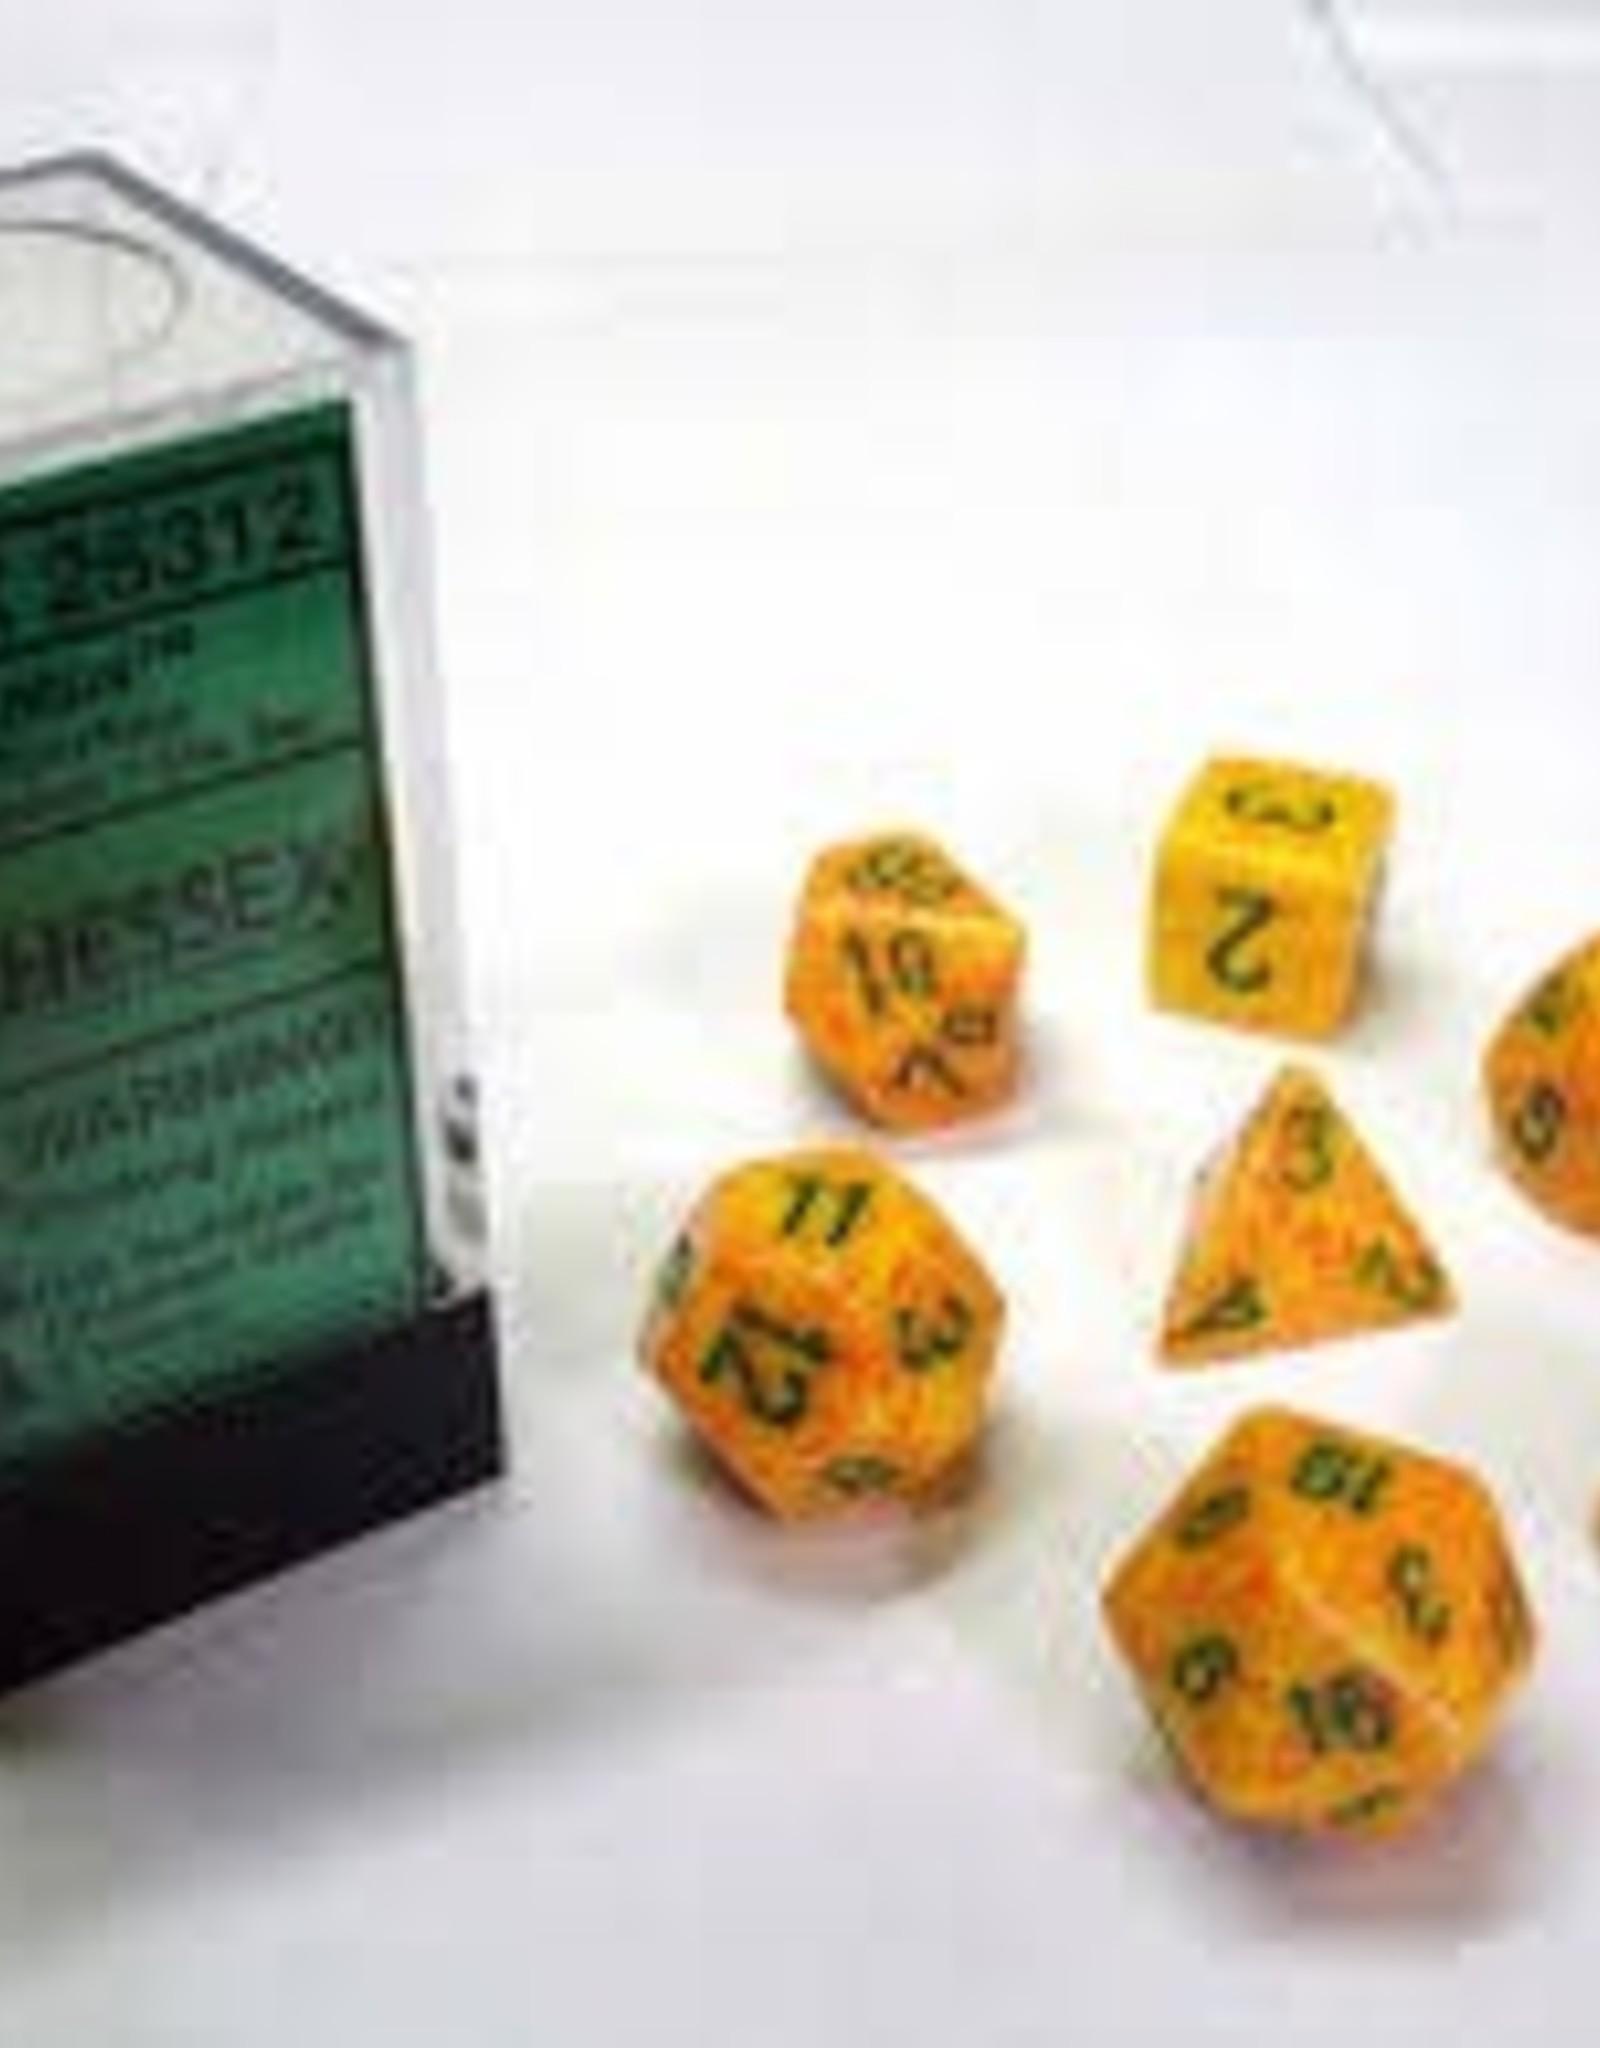 Chessex 25312 Dice